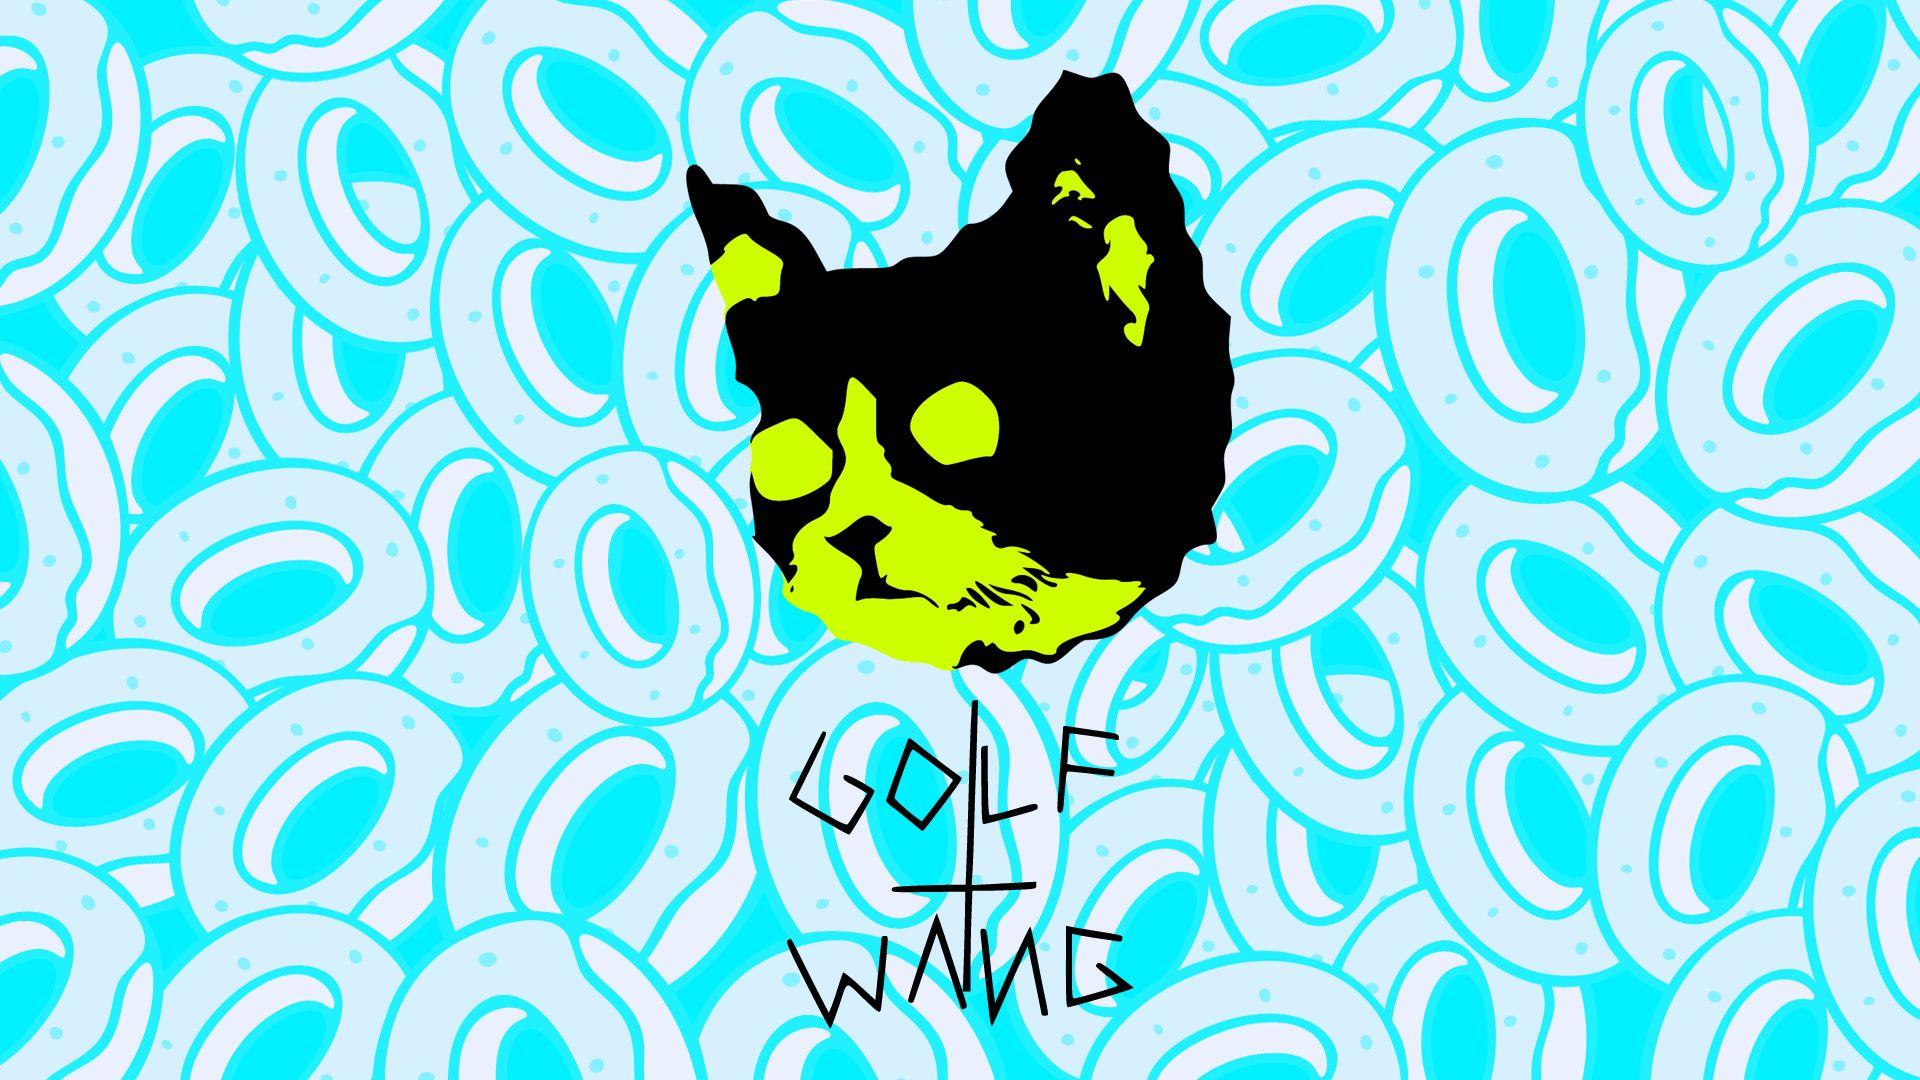 Golf Wang wallpaper theme